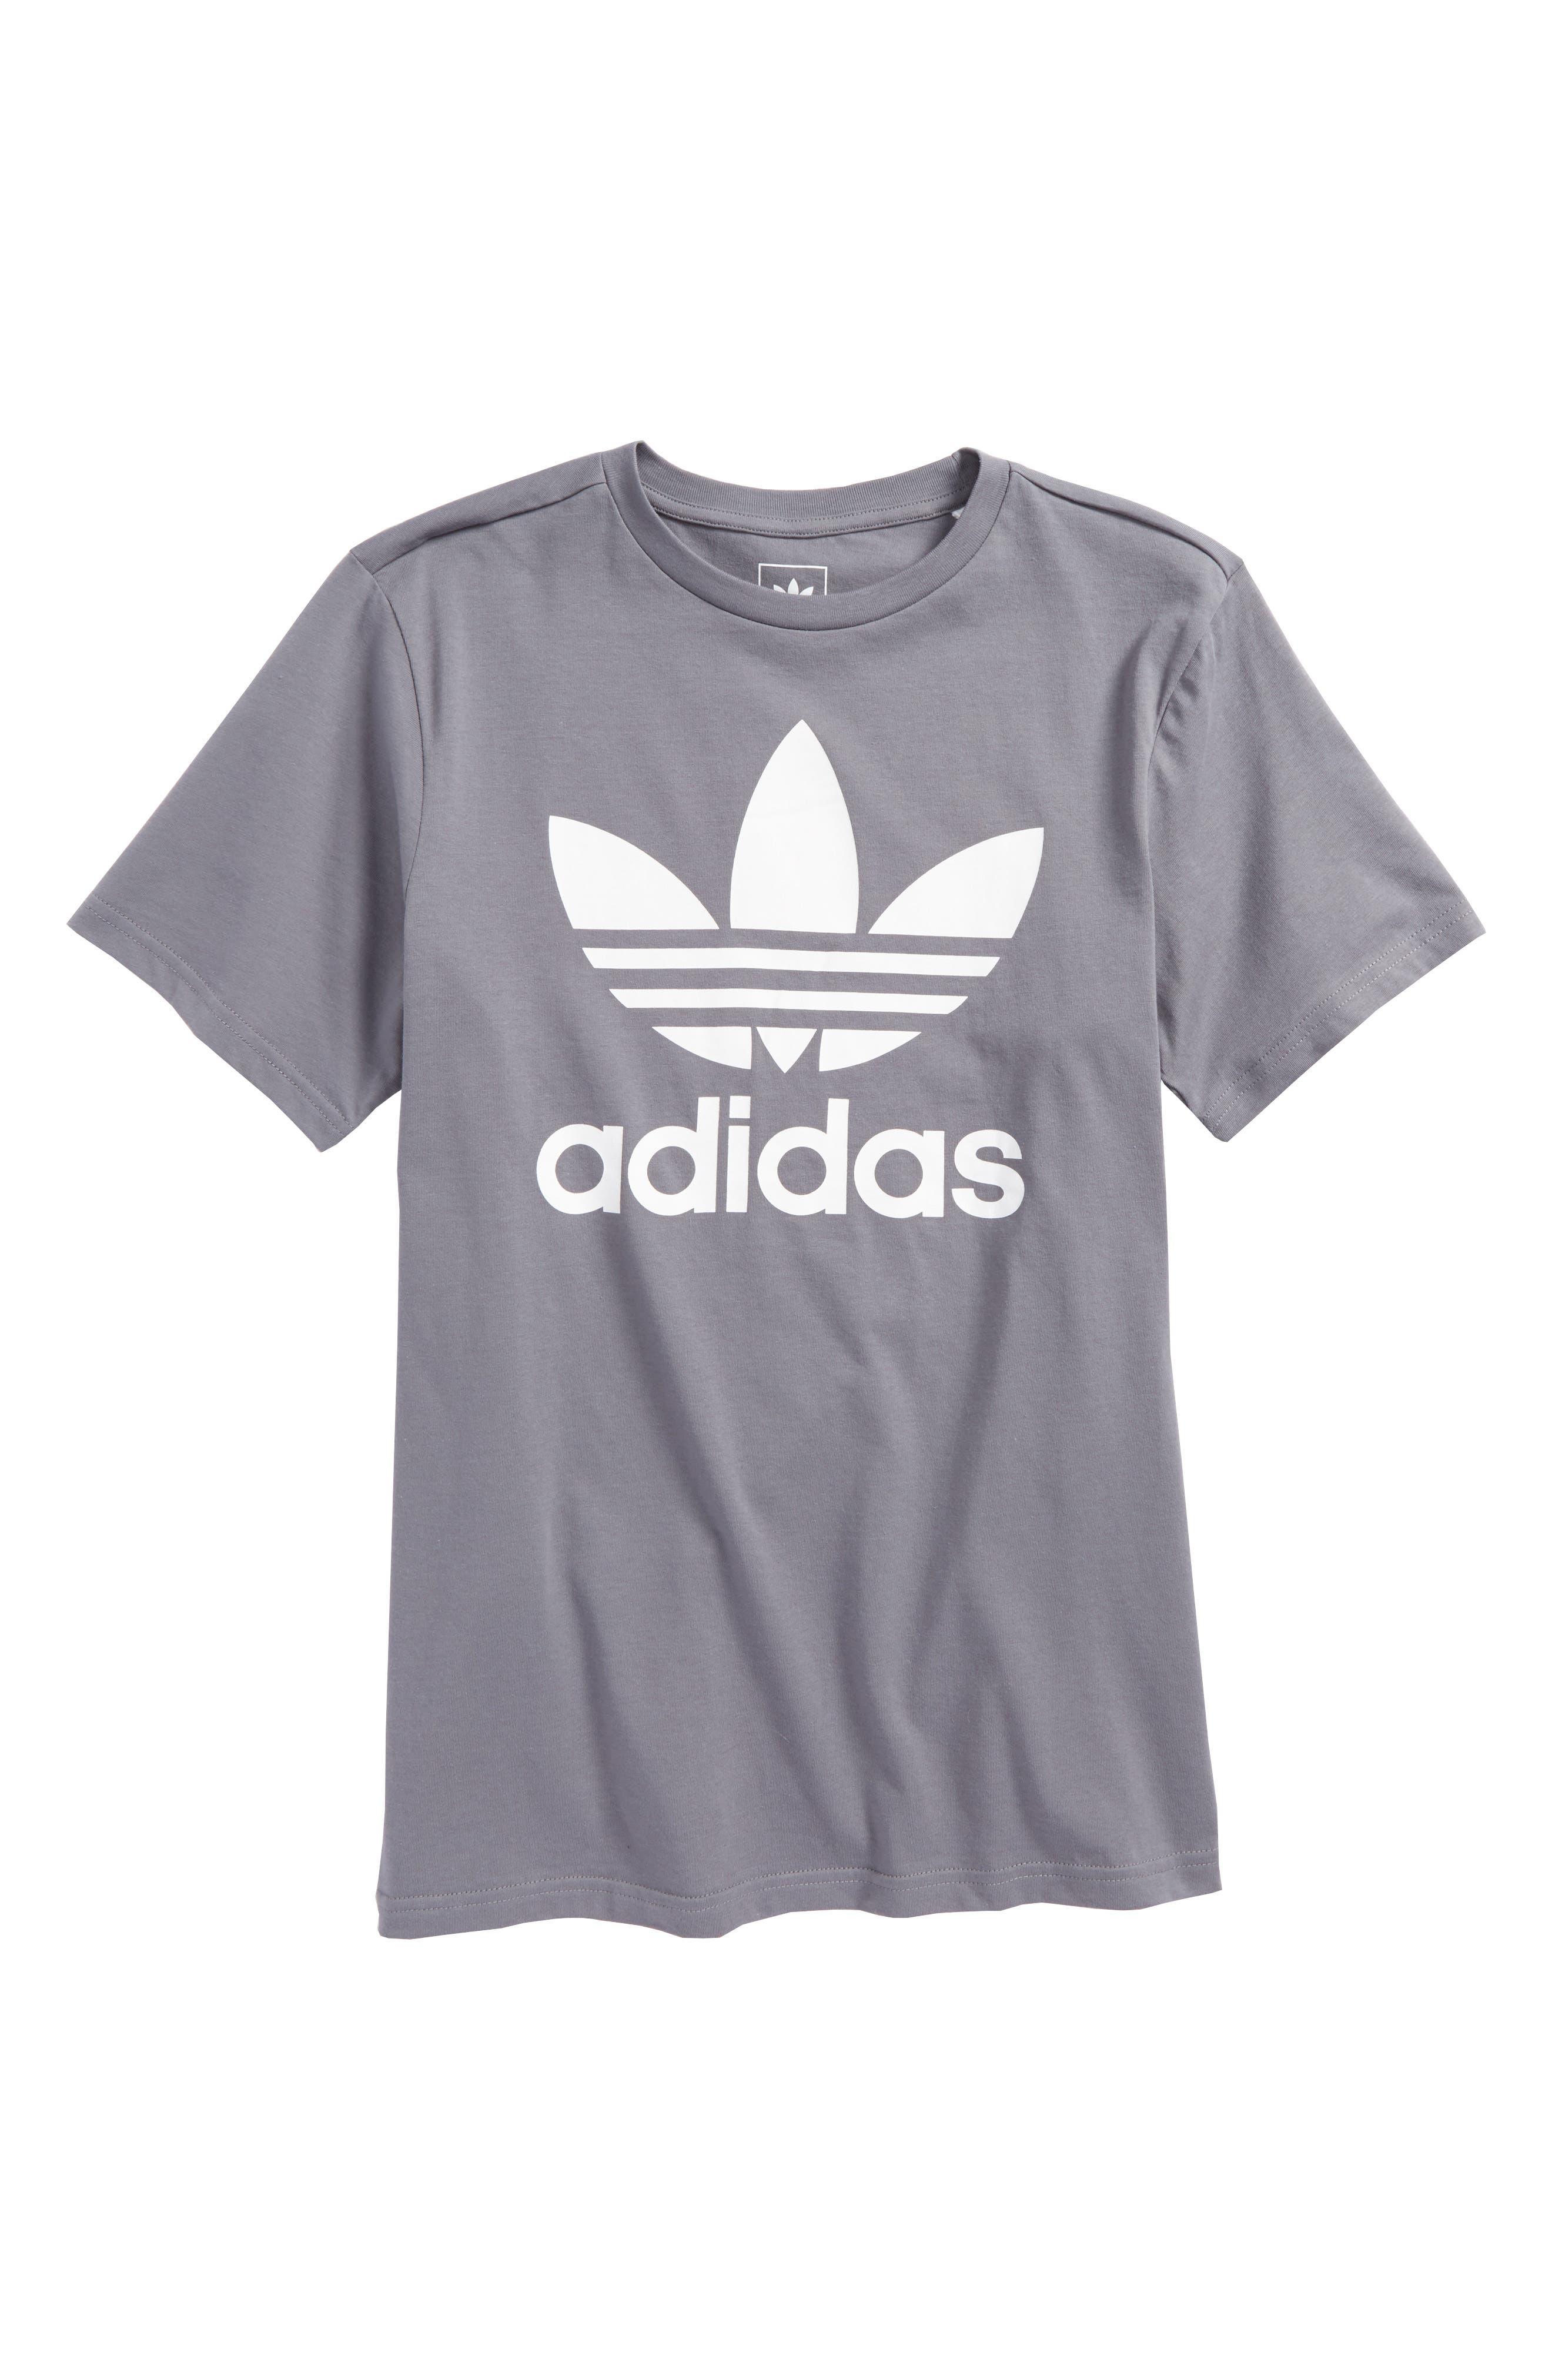 adidas Trefoil Logo T-Shirt (Little Boys & Big Boys)